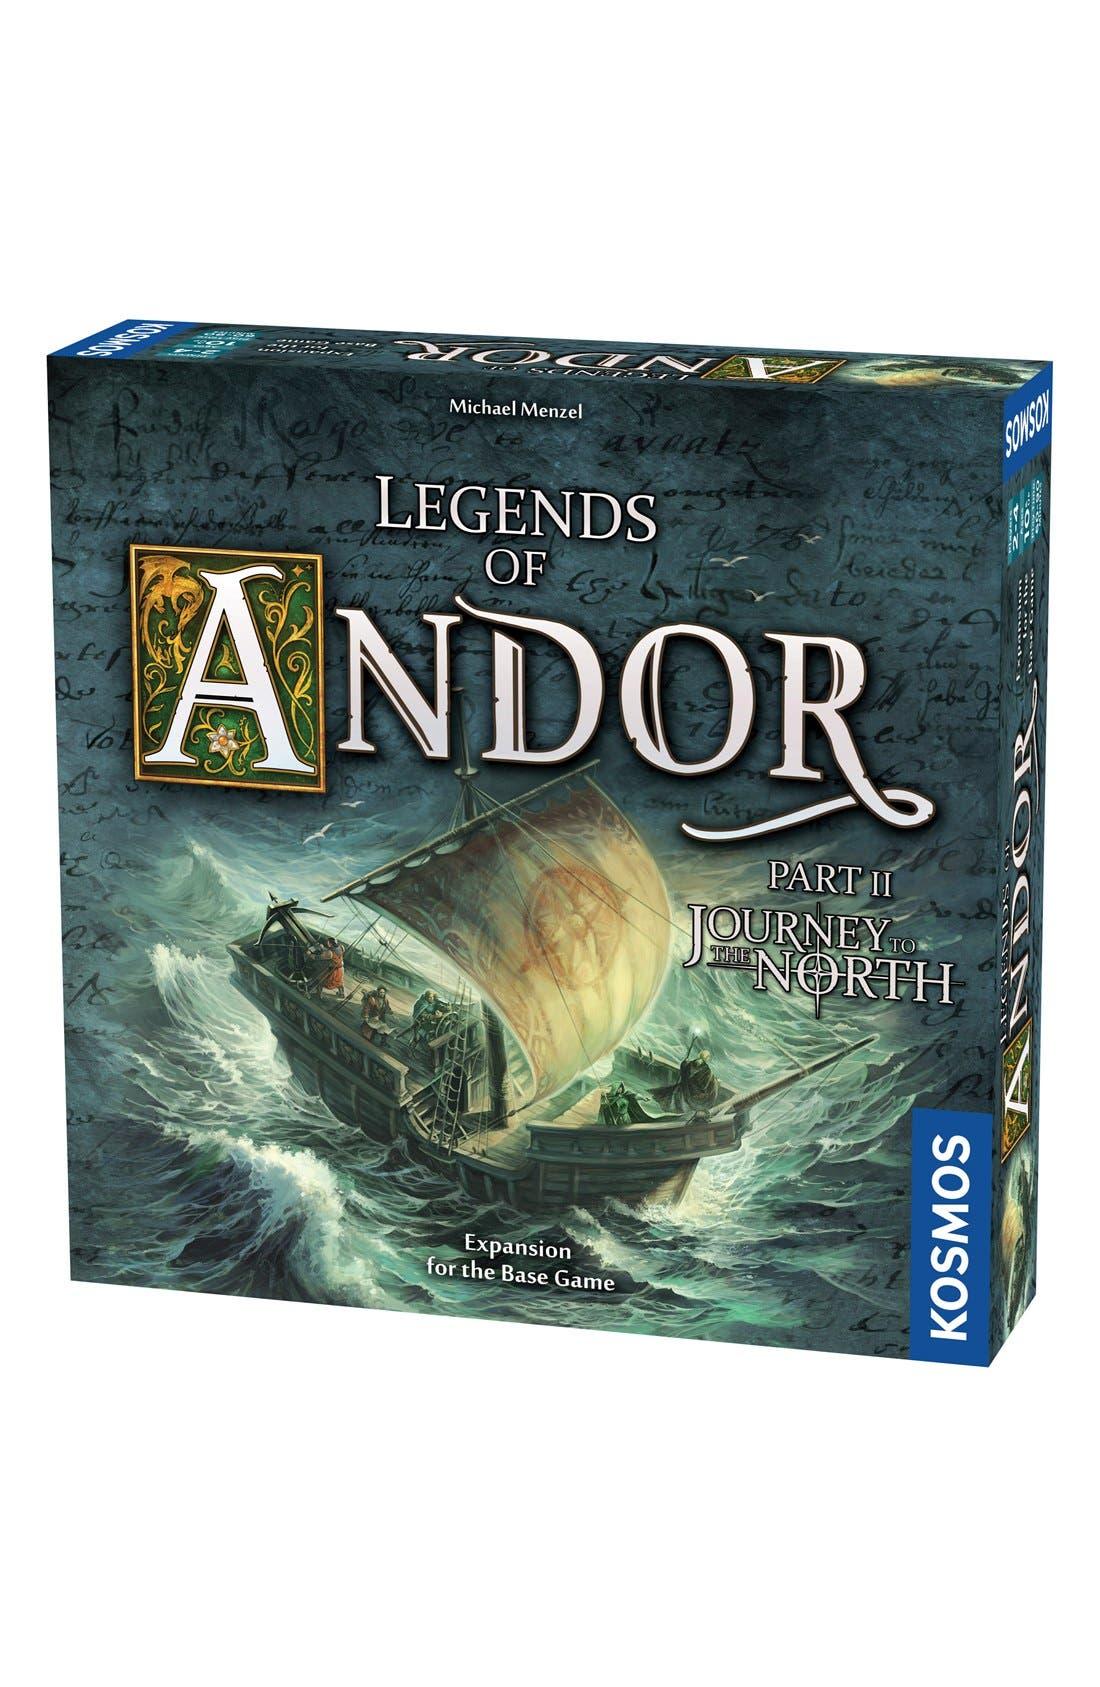 Thames & Kosmos 'Legends of Andor - Journey' Game Expansion Pack